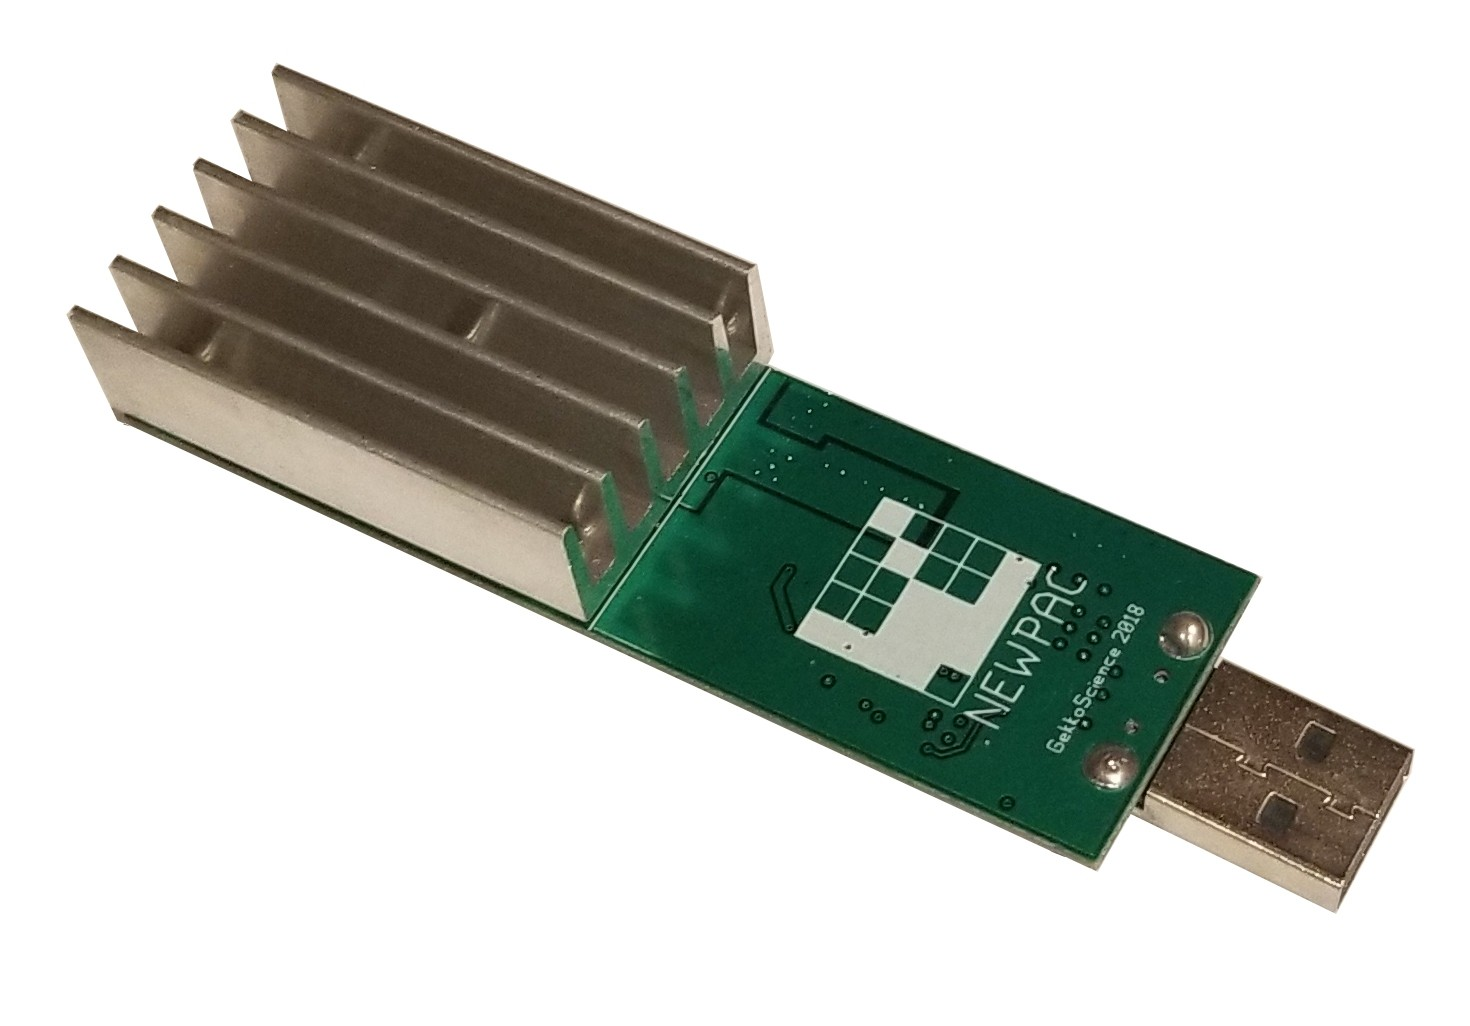 --NEW-- GekkoScience NewPac BM1387 Dual Chip Stickminer 28gh/s+.